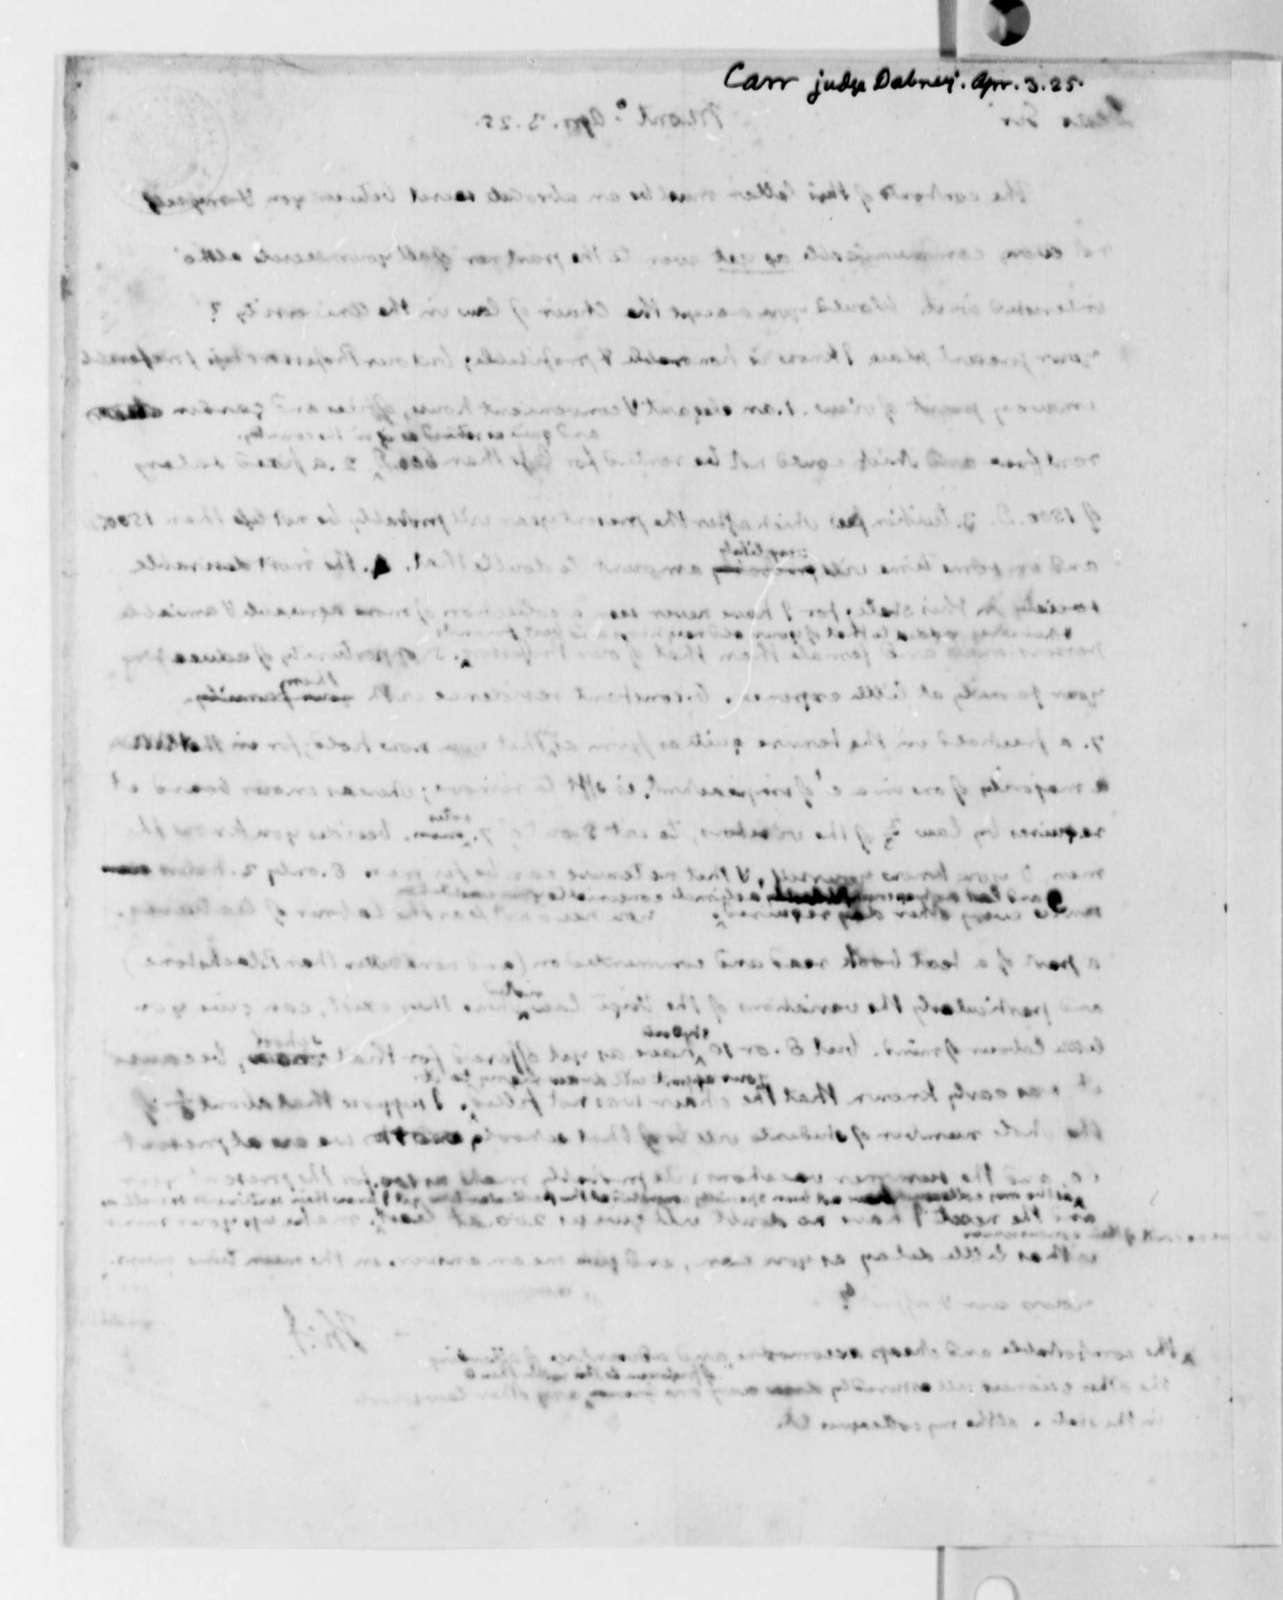 Thomas Jefferson to Dabney Carr, April 3, 1825